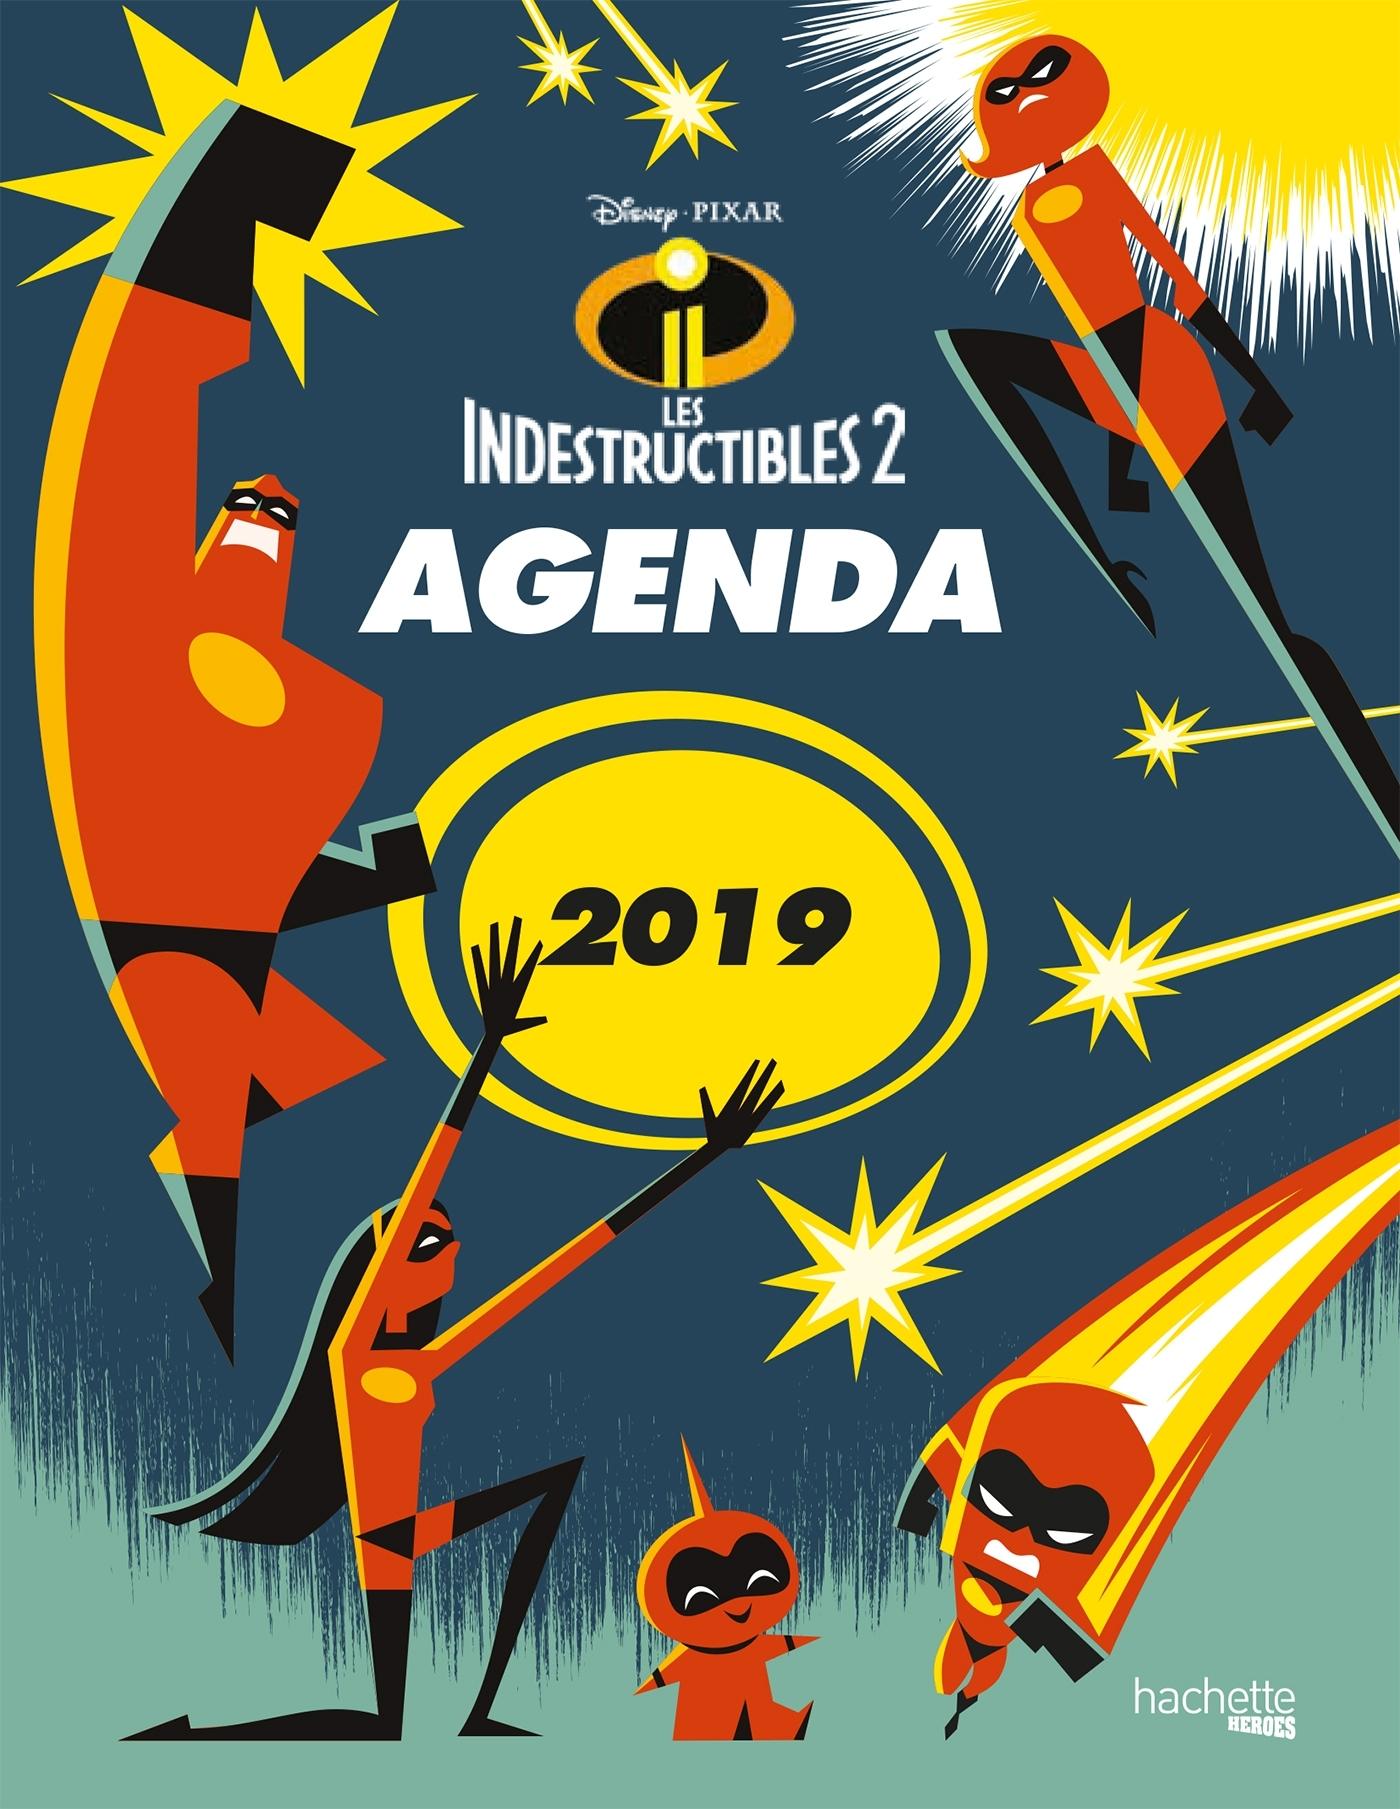 AGENDA INDESTRUCTIBLES 2019